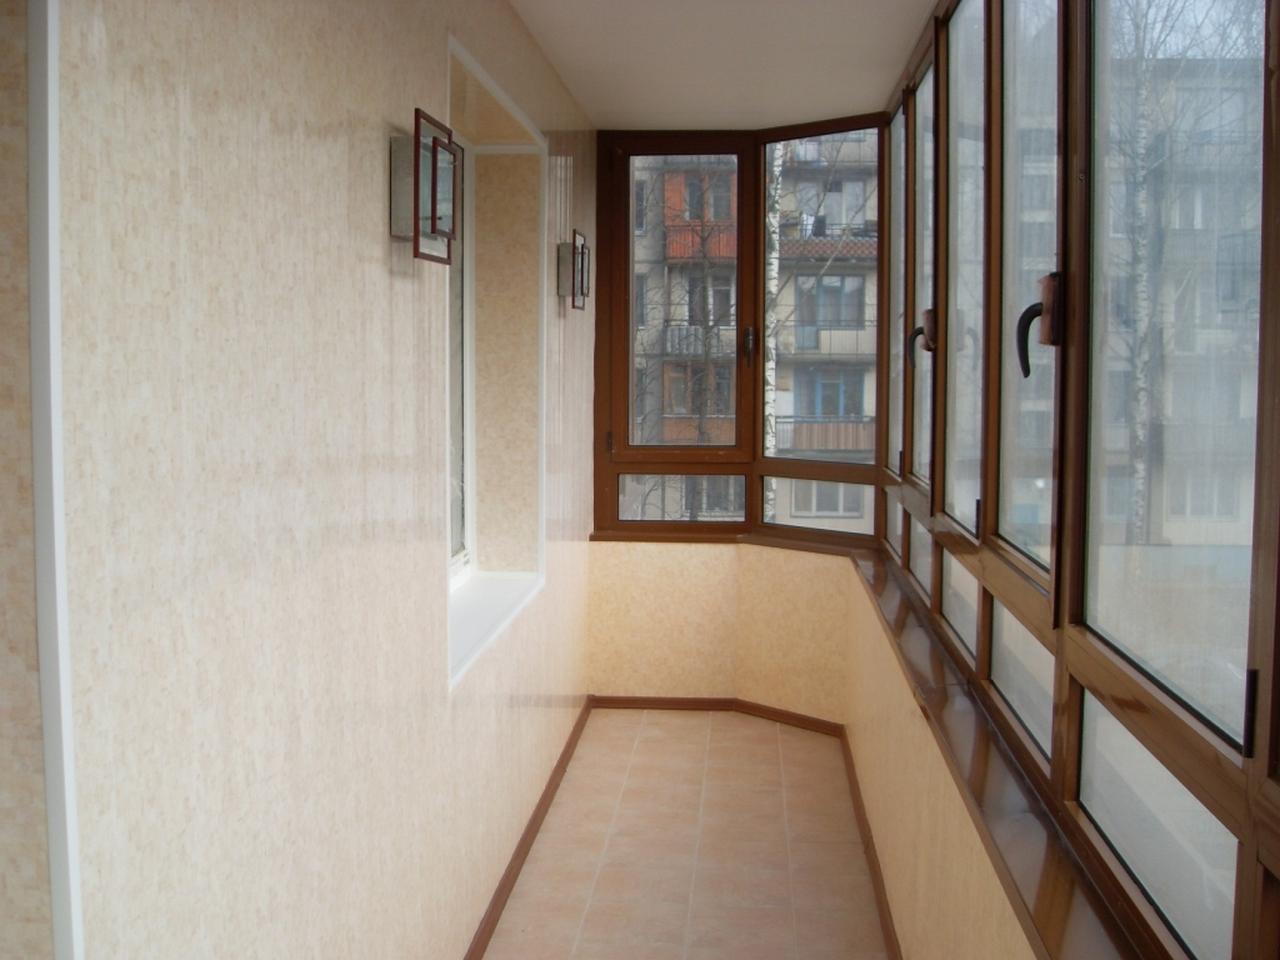 Предложение: ремонт и отделка балкона и лоджии, город.